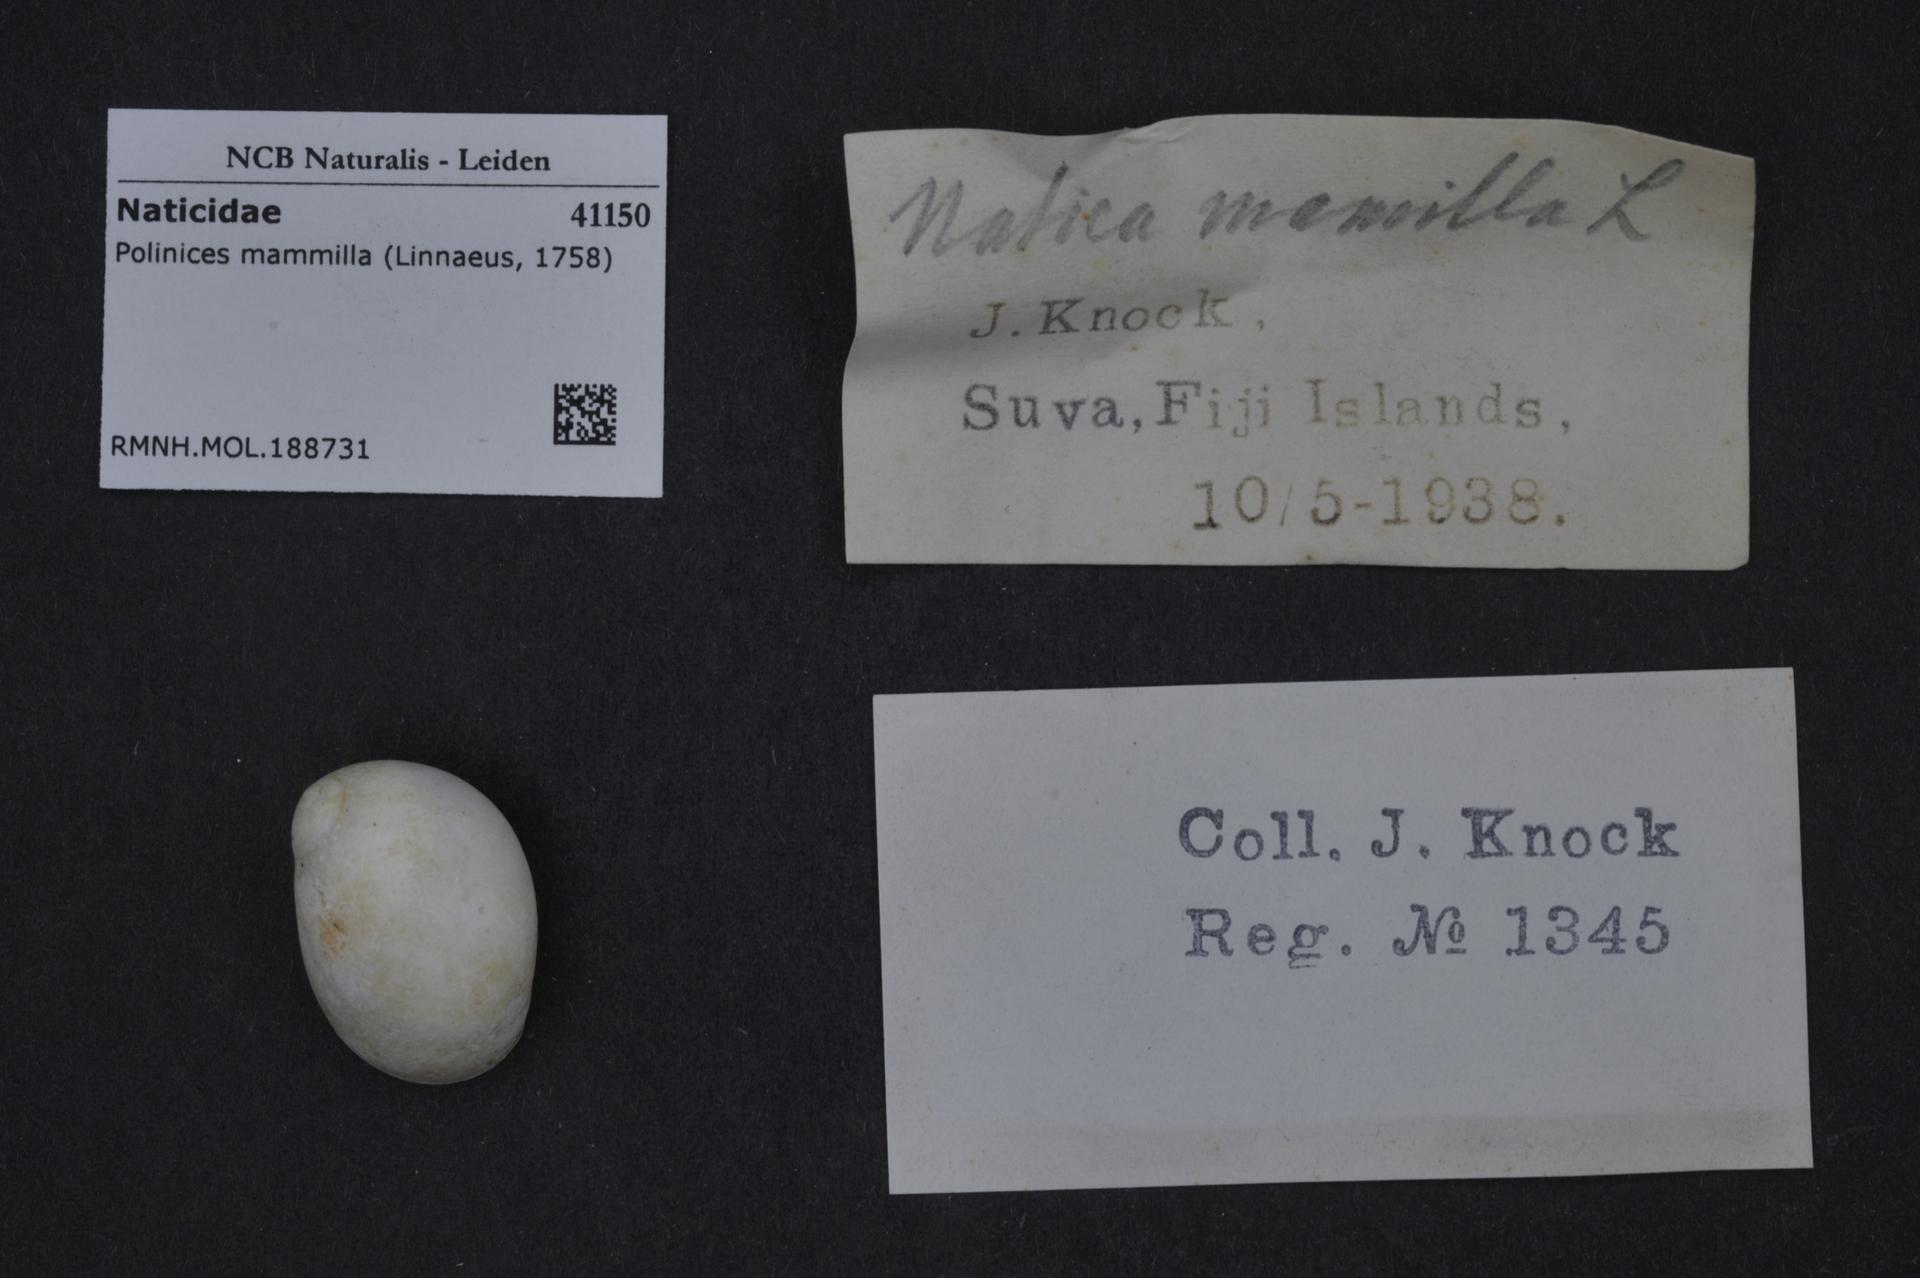 RMNH.MOL.188731 | Polinices mammilla (Linnaeus, 1758)